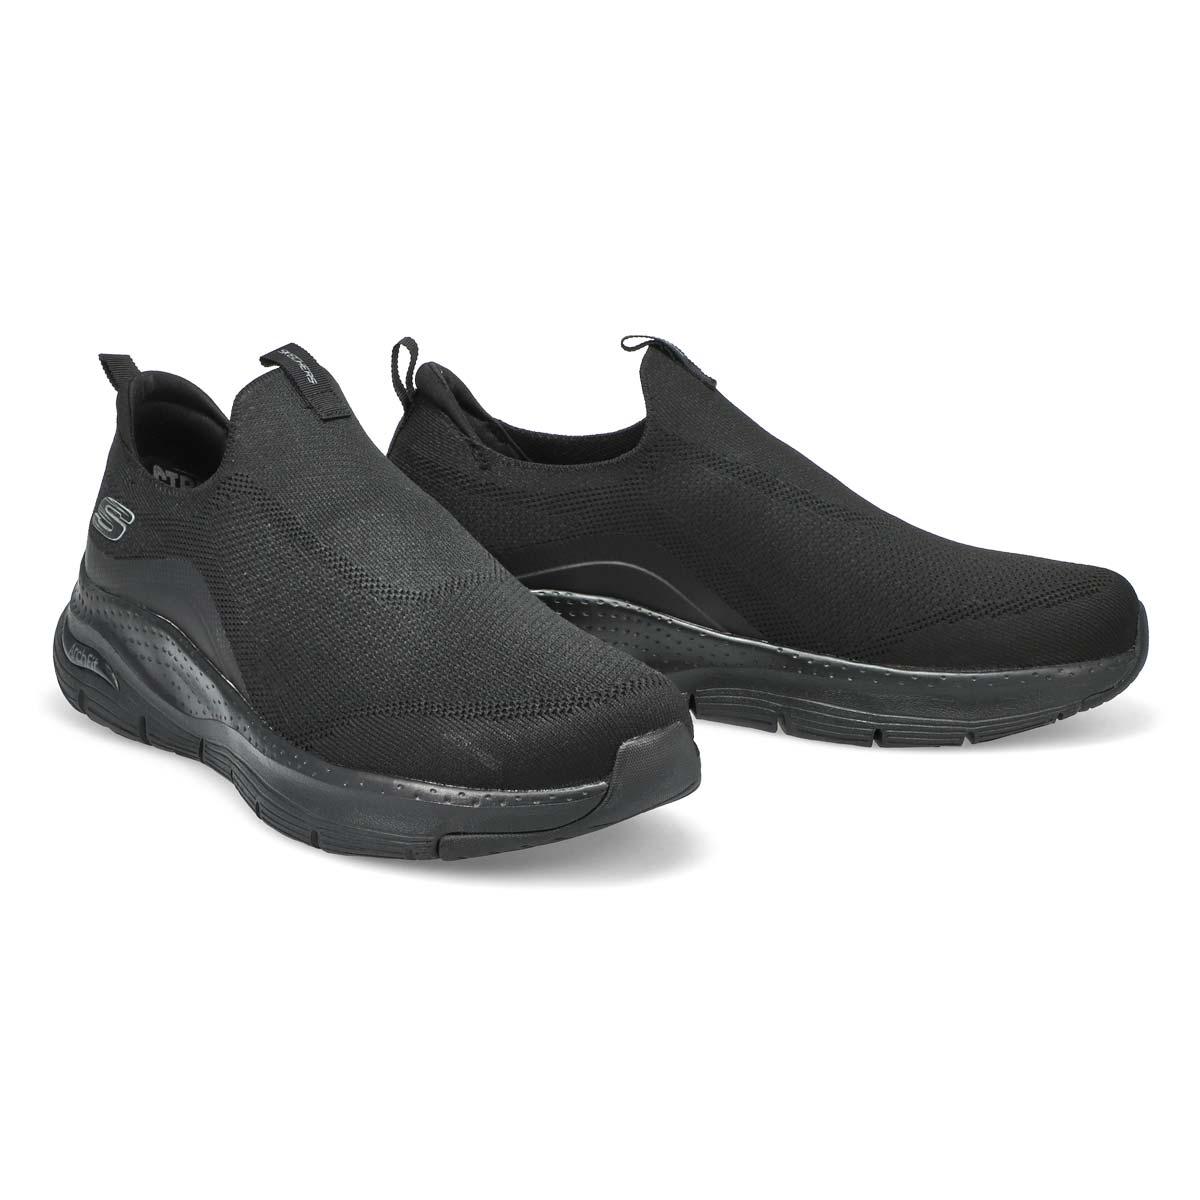 Men's Arch Fit Slip On Sneaker - Black/Black